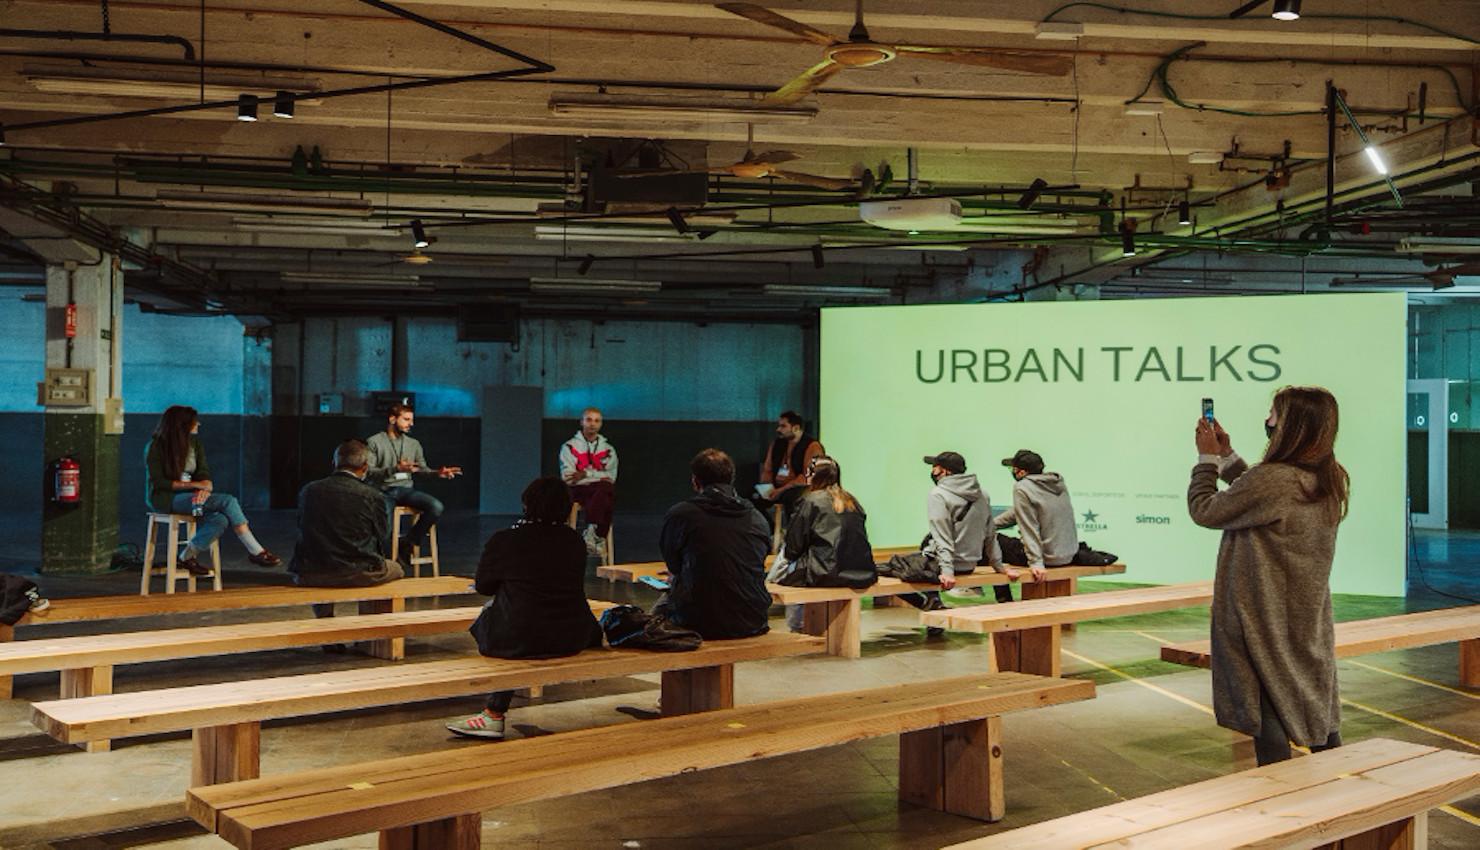 Urban-talks-poblenou-urban-district-magazinehorse